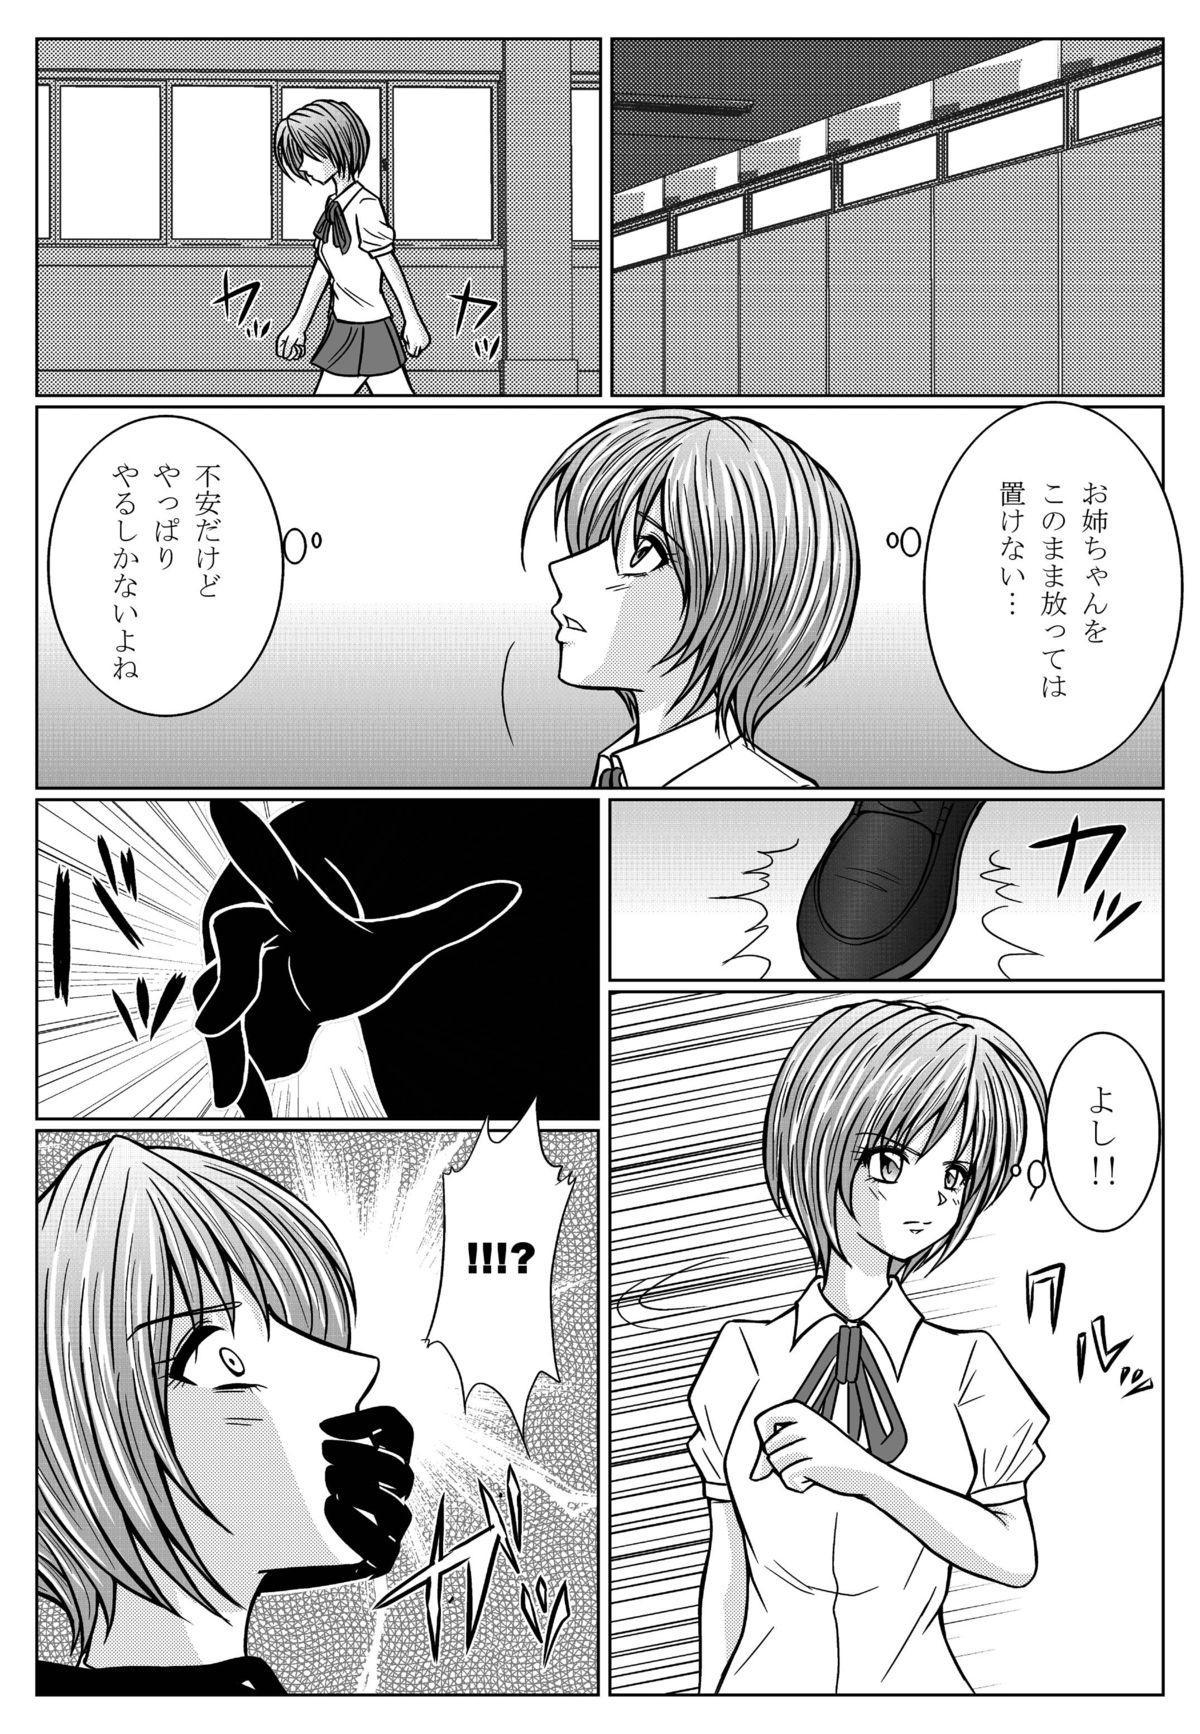 [Macxe's (monmon)] Tokubousentai Dinaranger ~Heroine Kairaku Sennou Keikaku~ Vol.01/02/03 (Renkaban) [Digital] 85